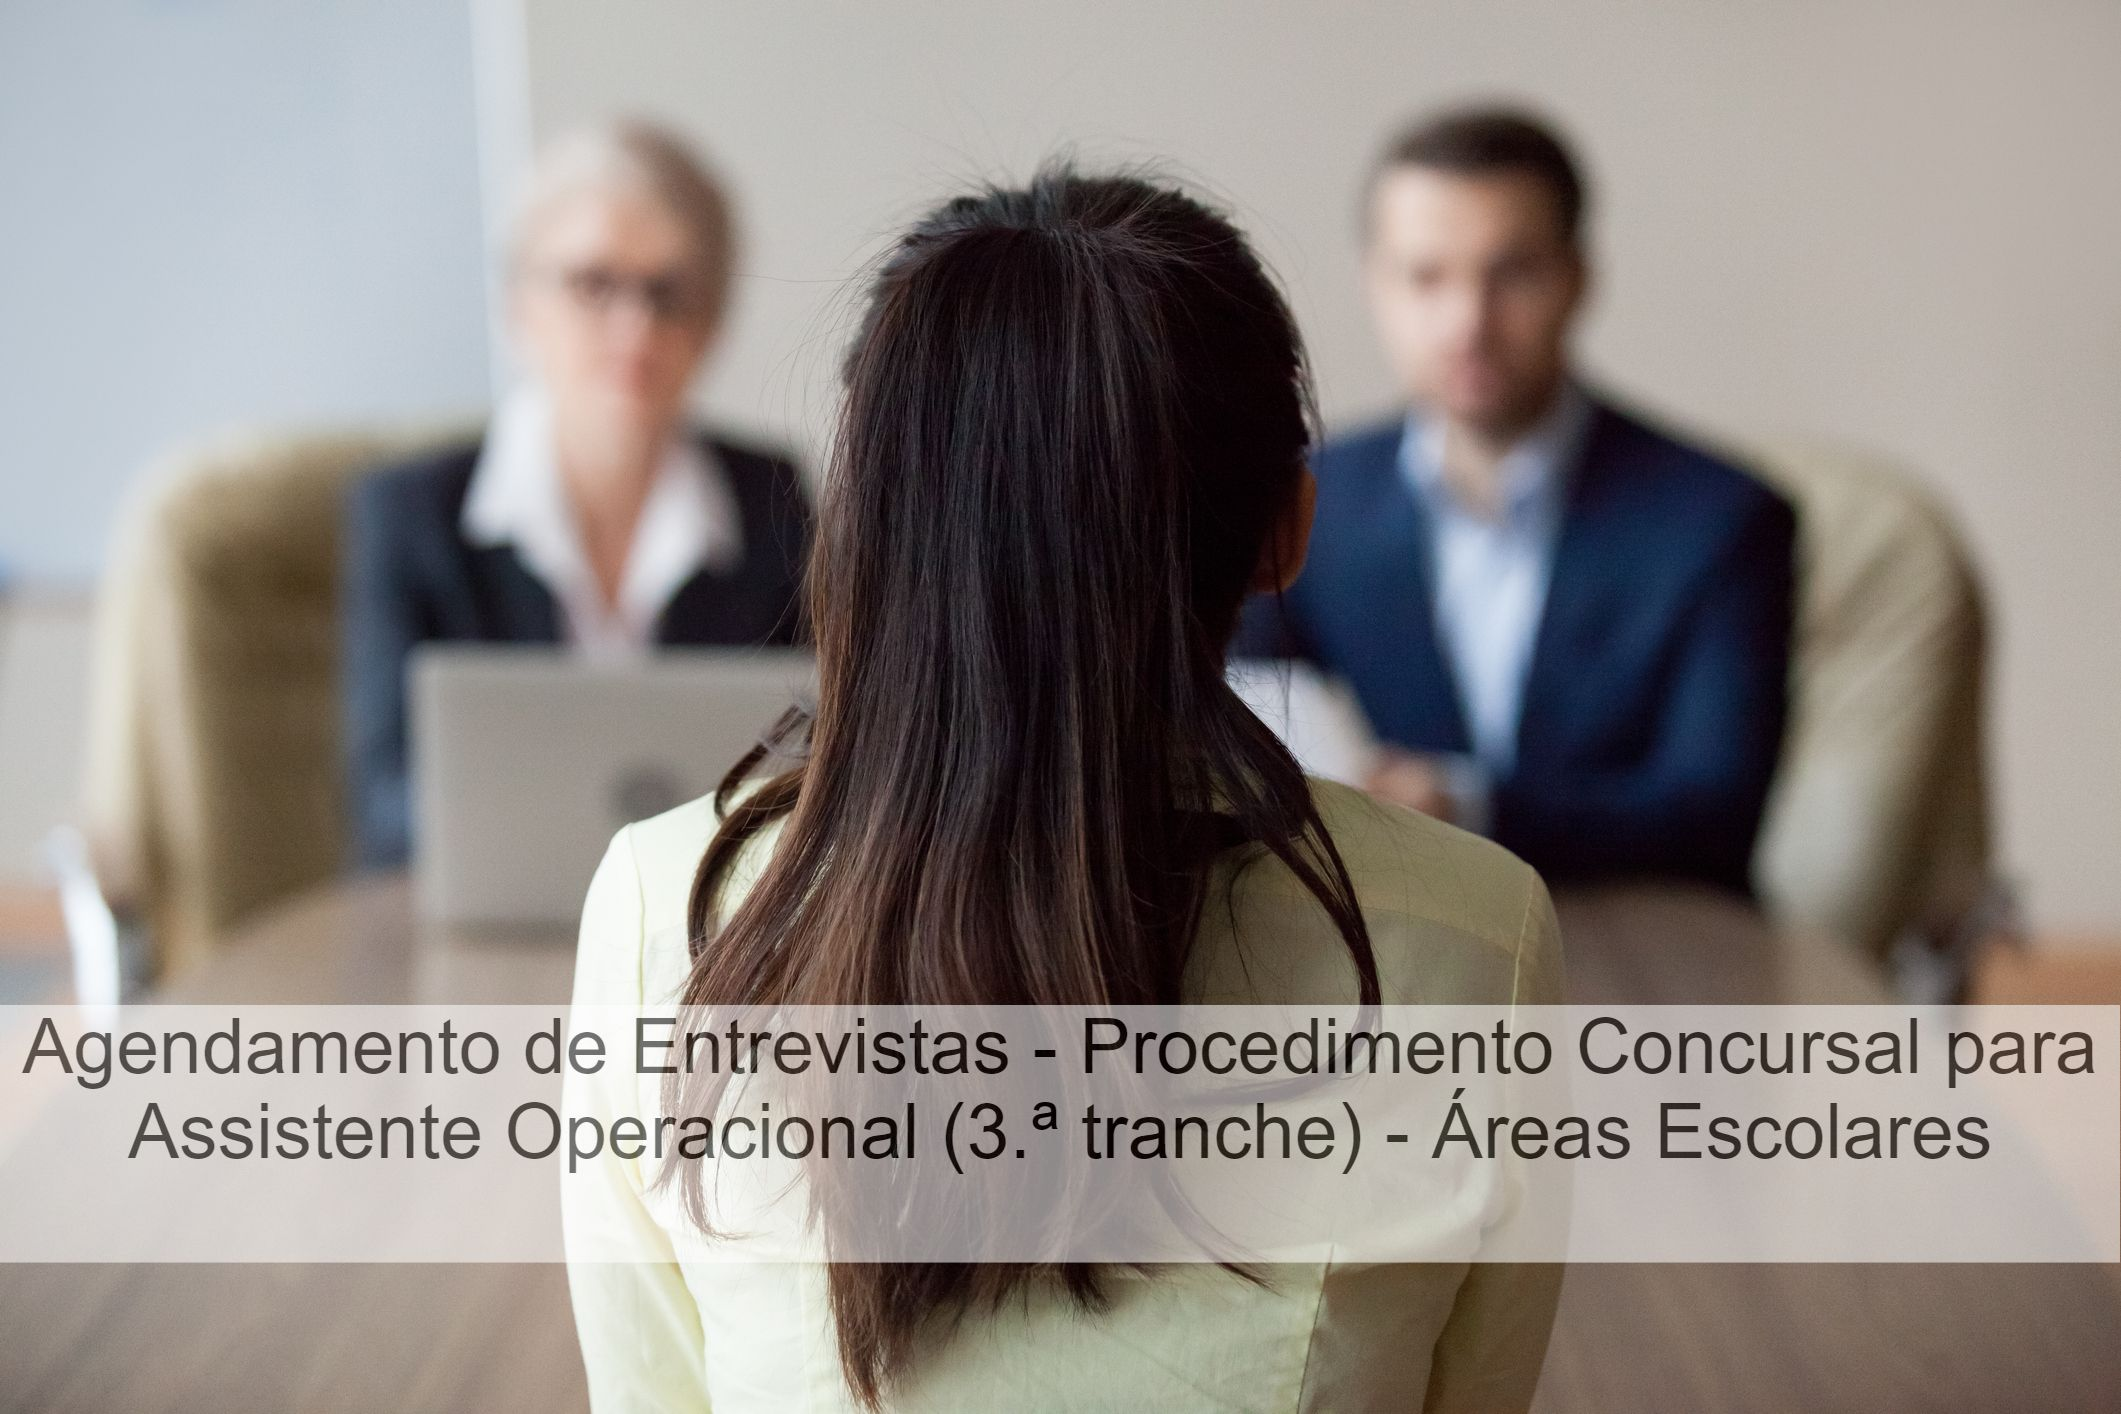 Agendamento de Entrevistas - Assistentes Operacionais - Áreas Escolares (3.ª tranche)